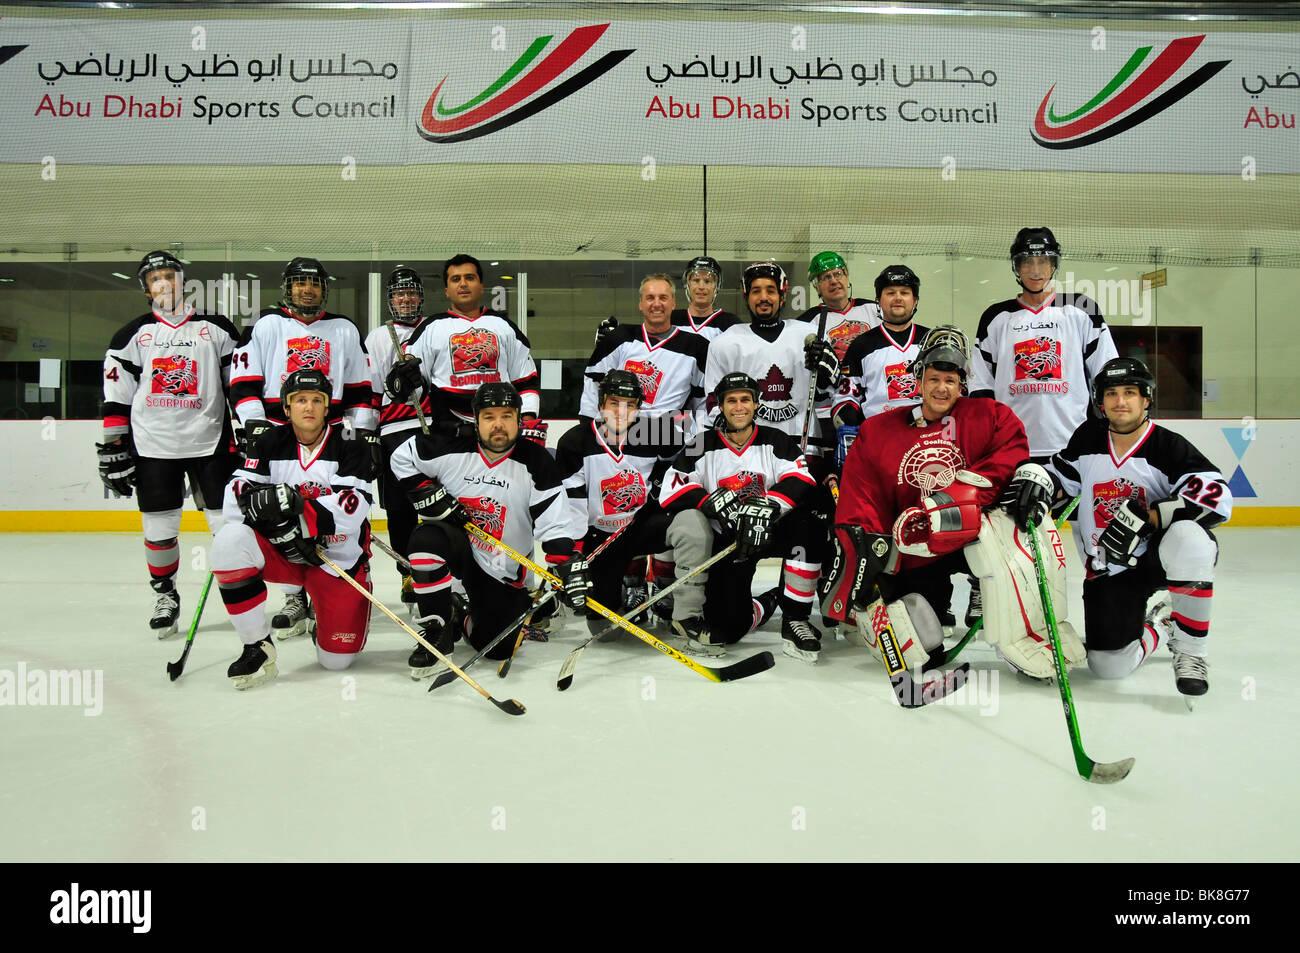 Ice hockey team The Abu Dhabi Scorpions in the ice hockey stadium, ice rink, Abu Dhabi, United Arab Emirates, Arabia, Stock Photo